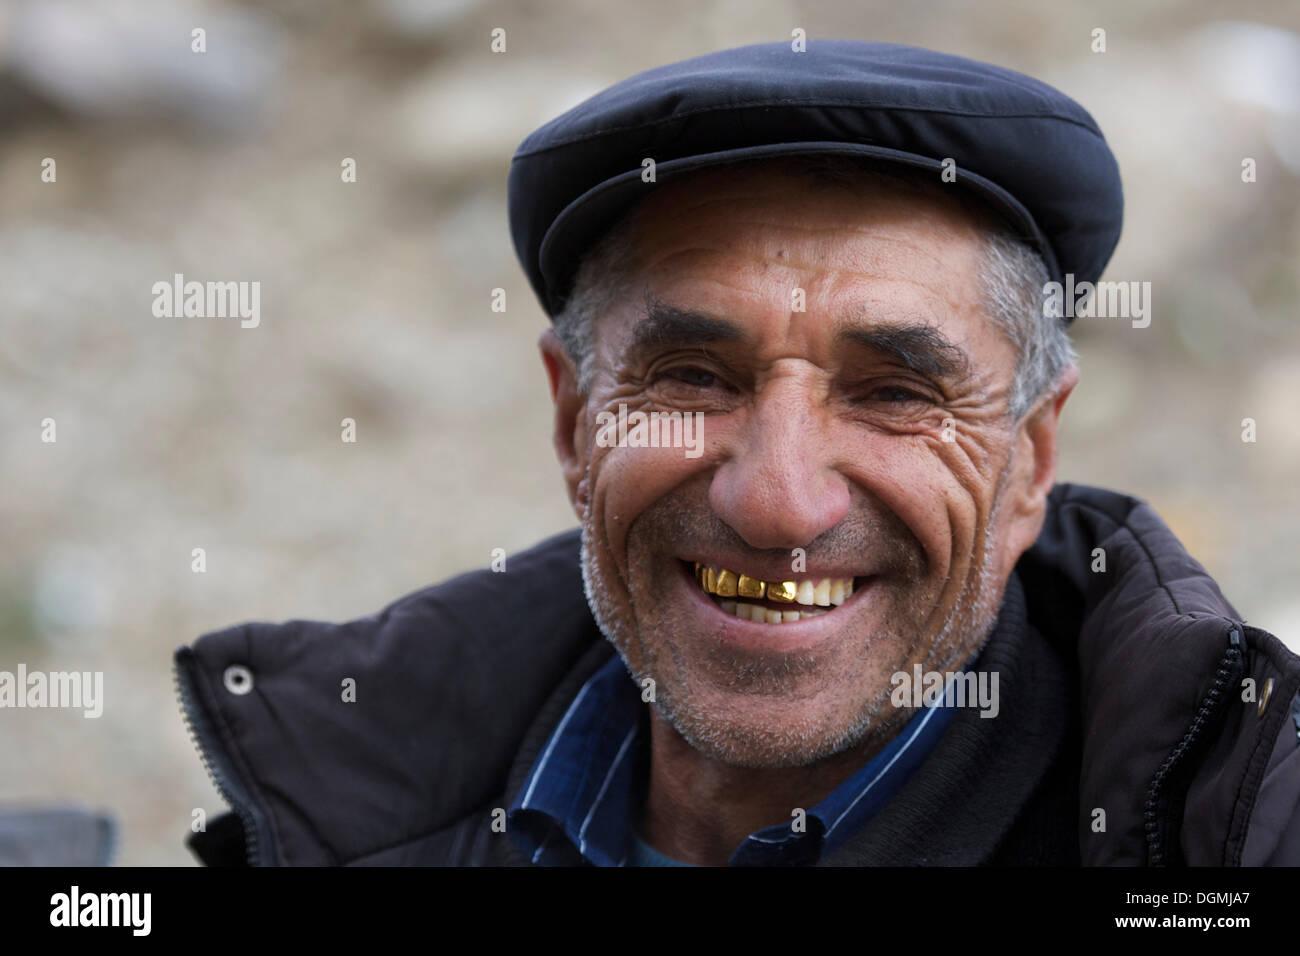 Gold Teeth Stock Photos & Gold Teeth Stock Images - Alamy